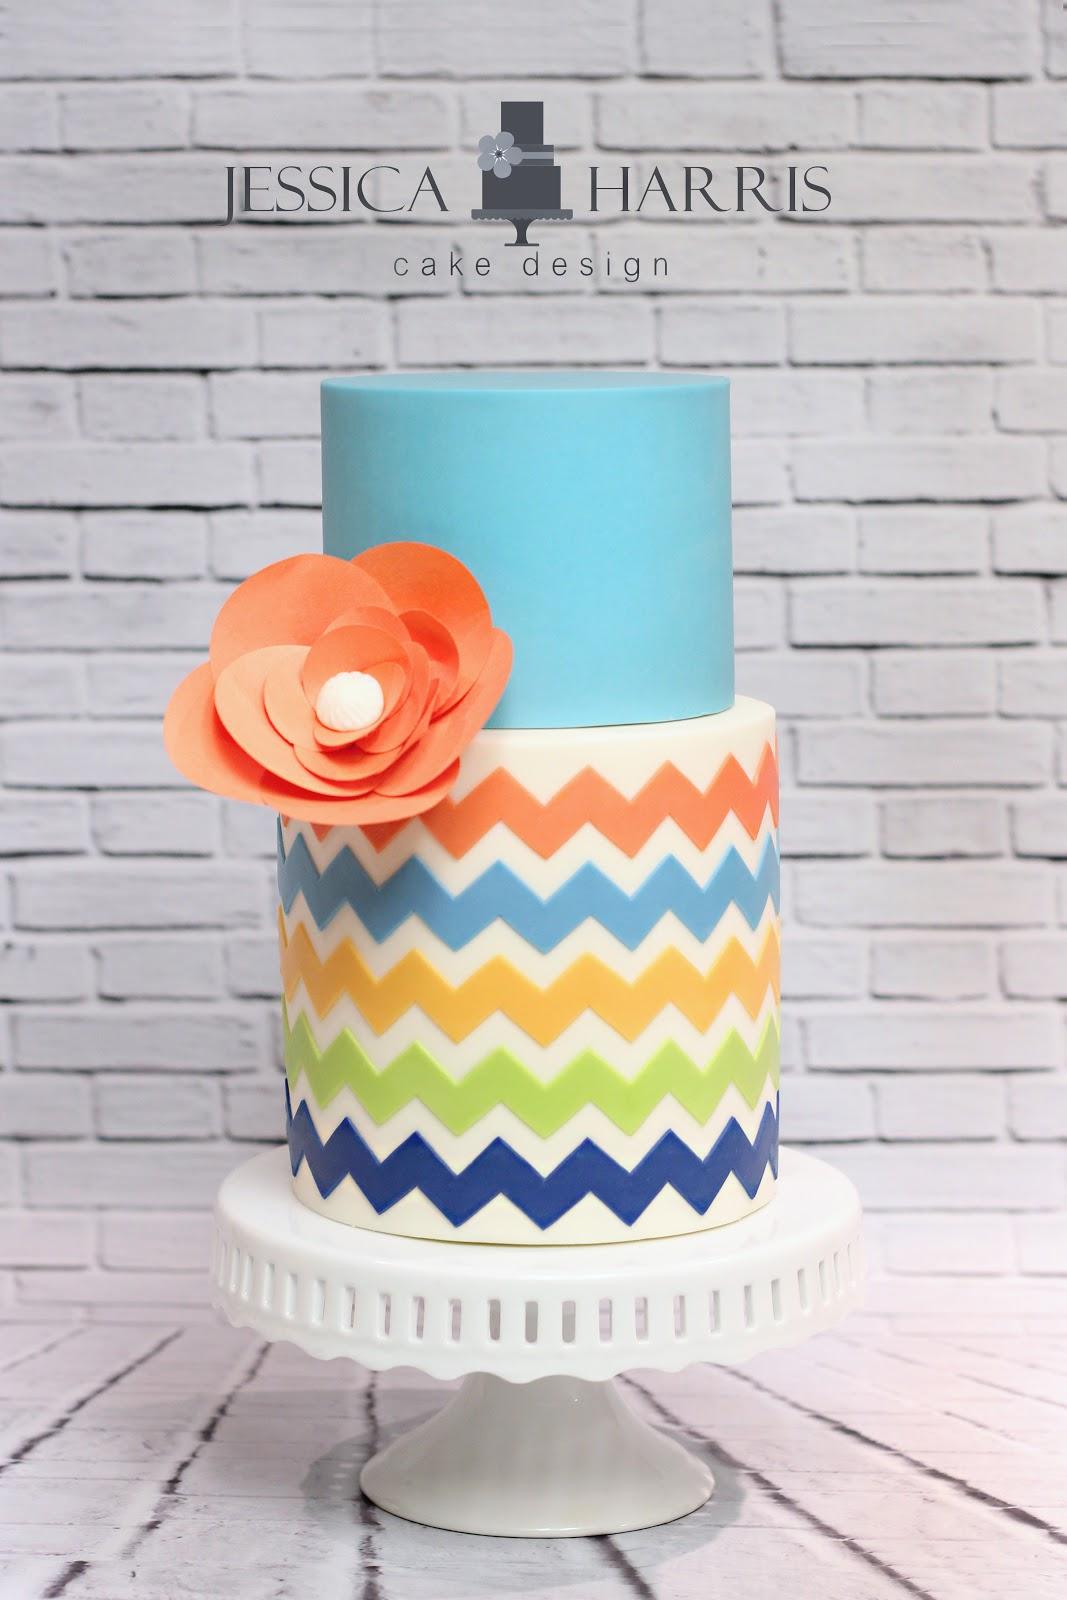 Template Tuesday Chevron Cake Design Jessica Harris Cake Design